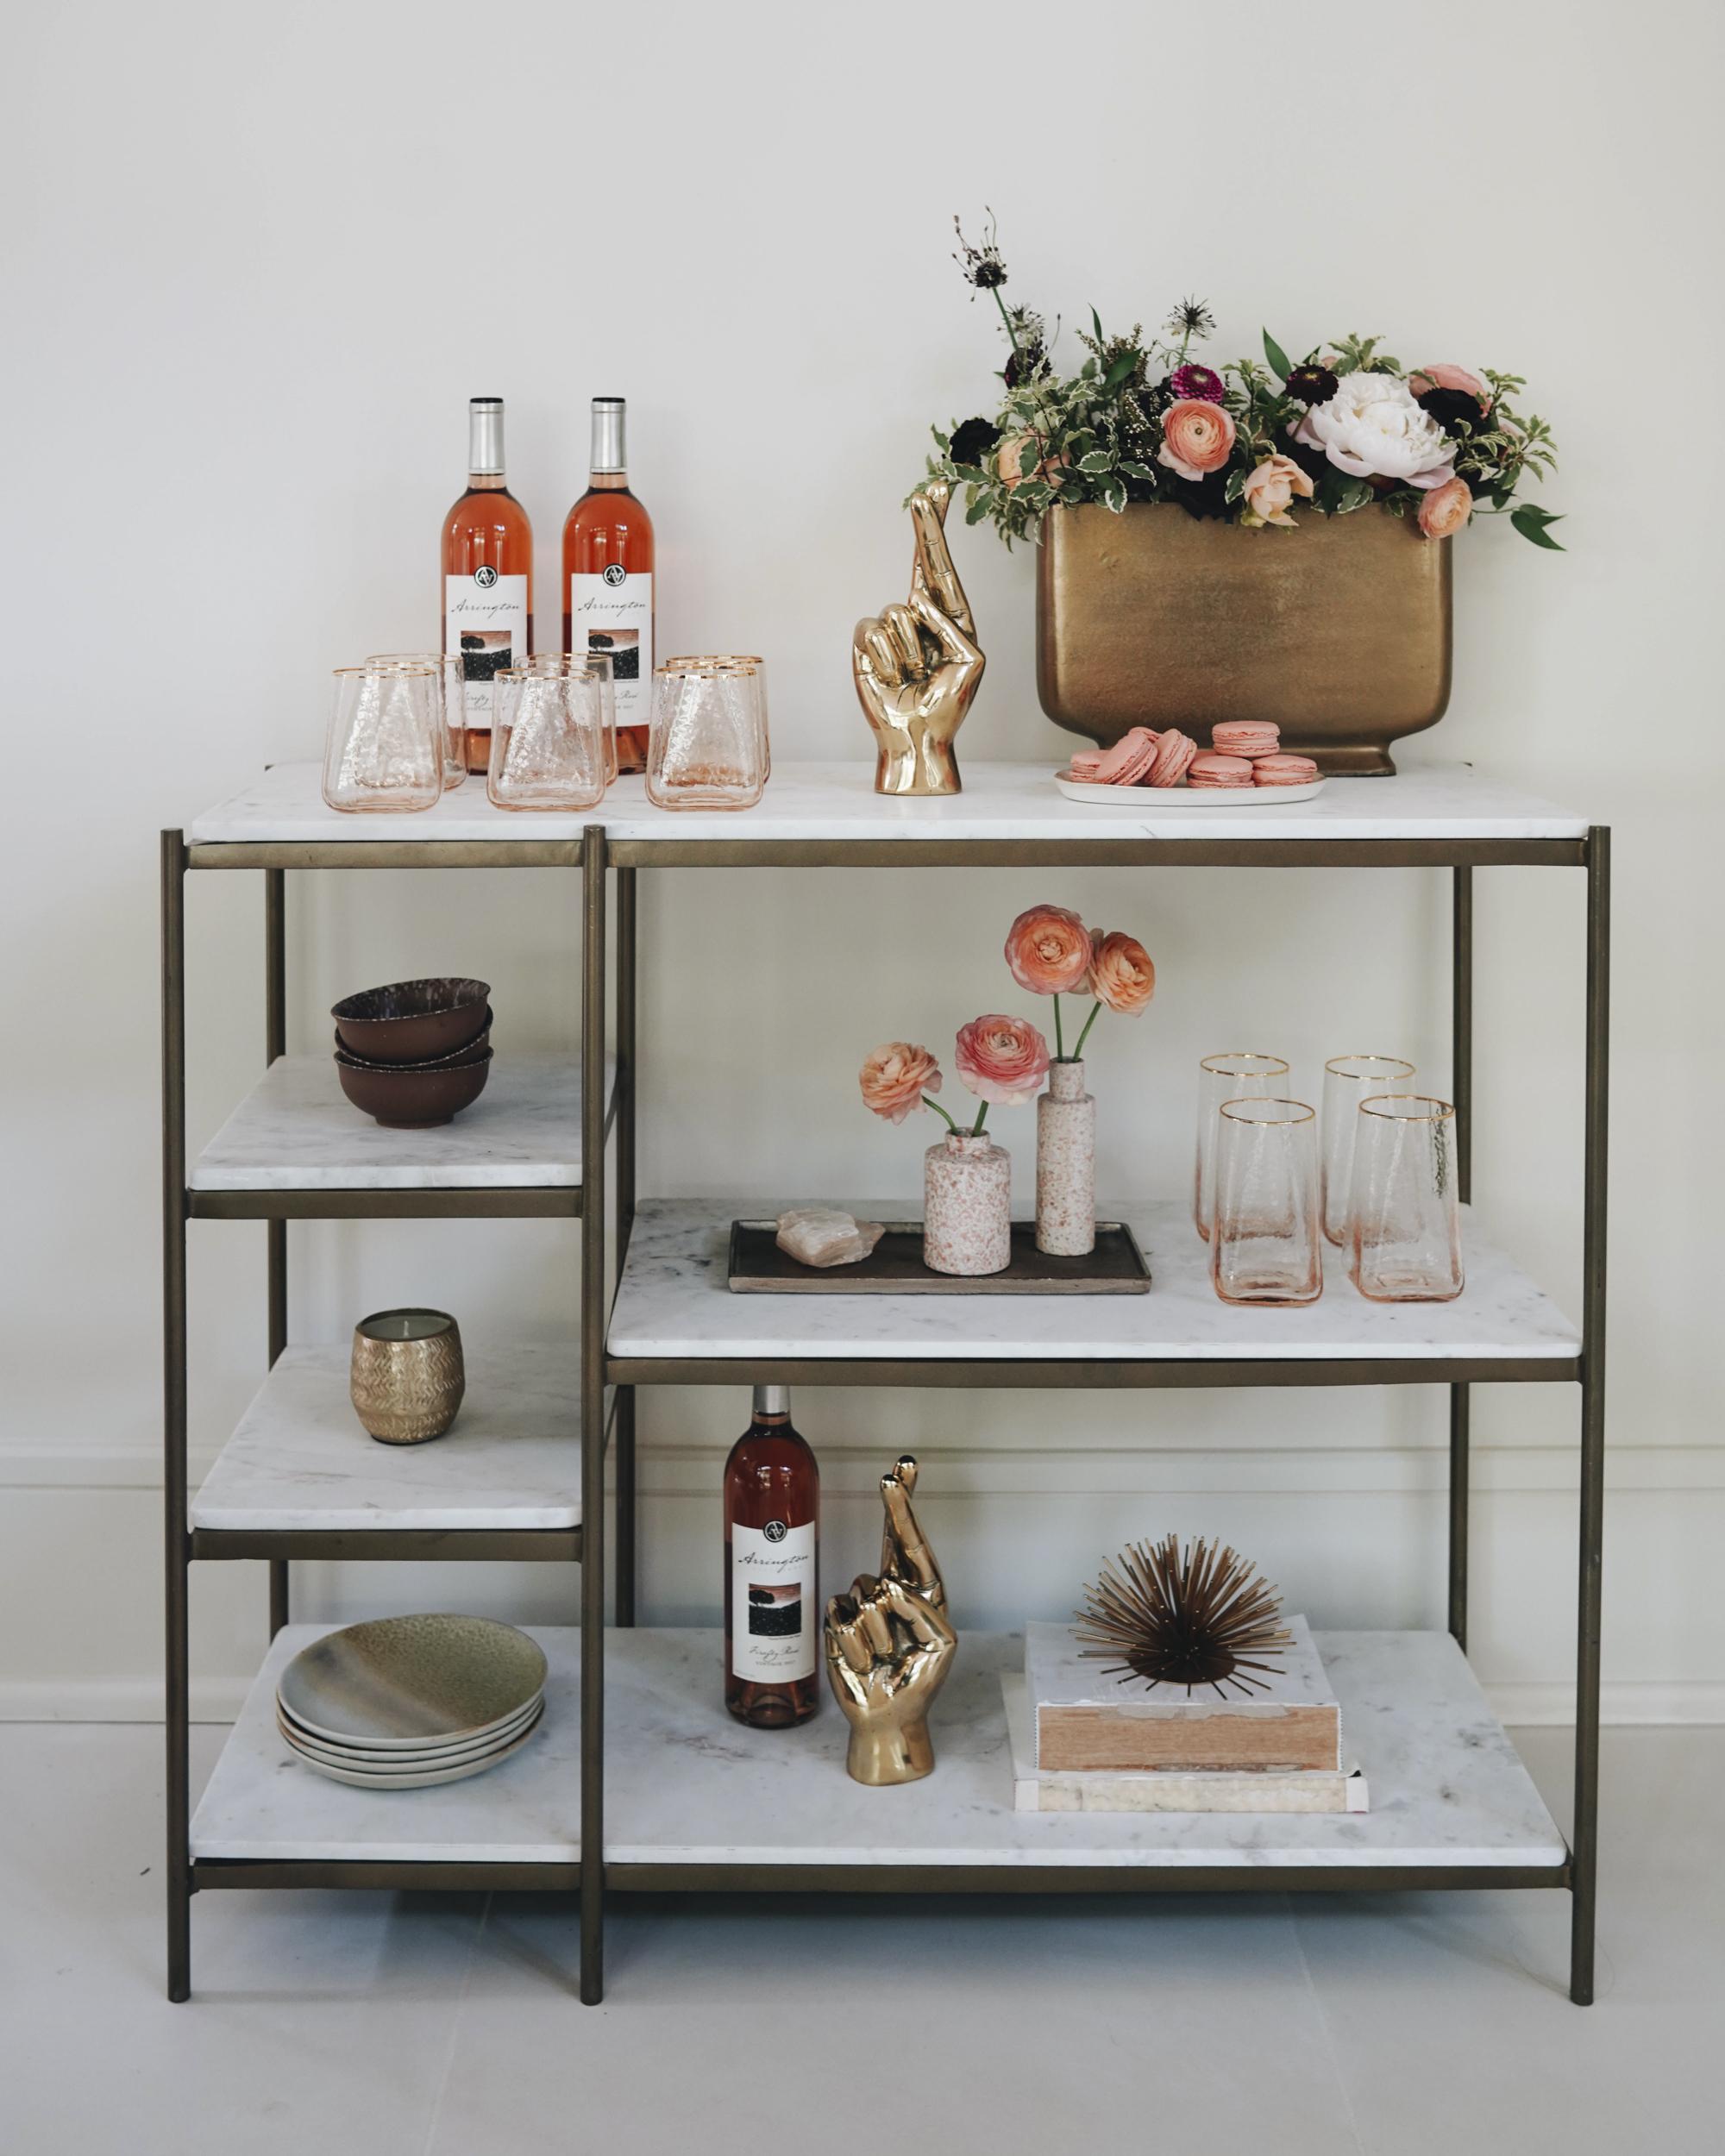 25-mayker-happily-grey-rosé-tablescape.jpg